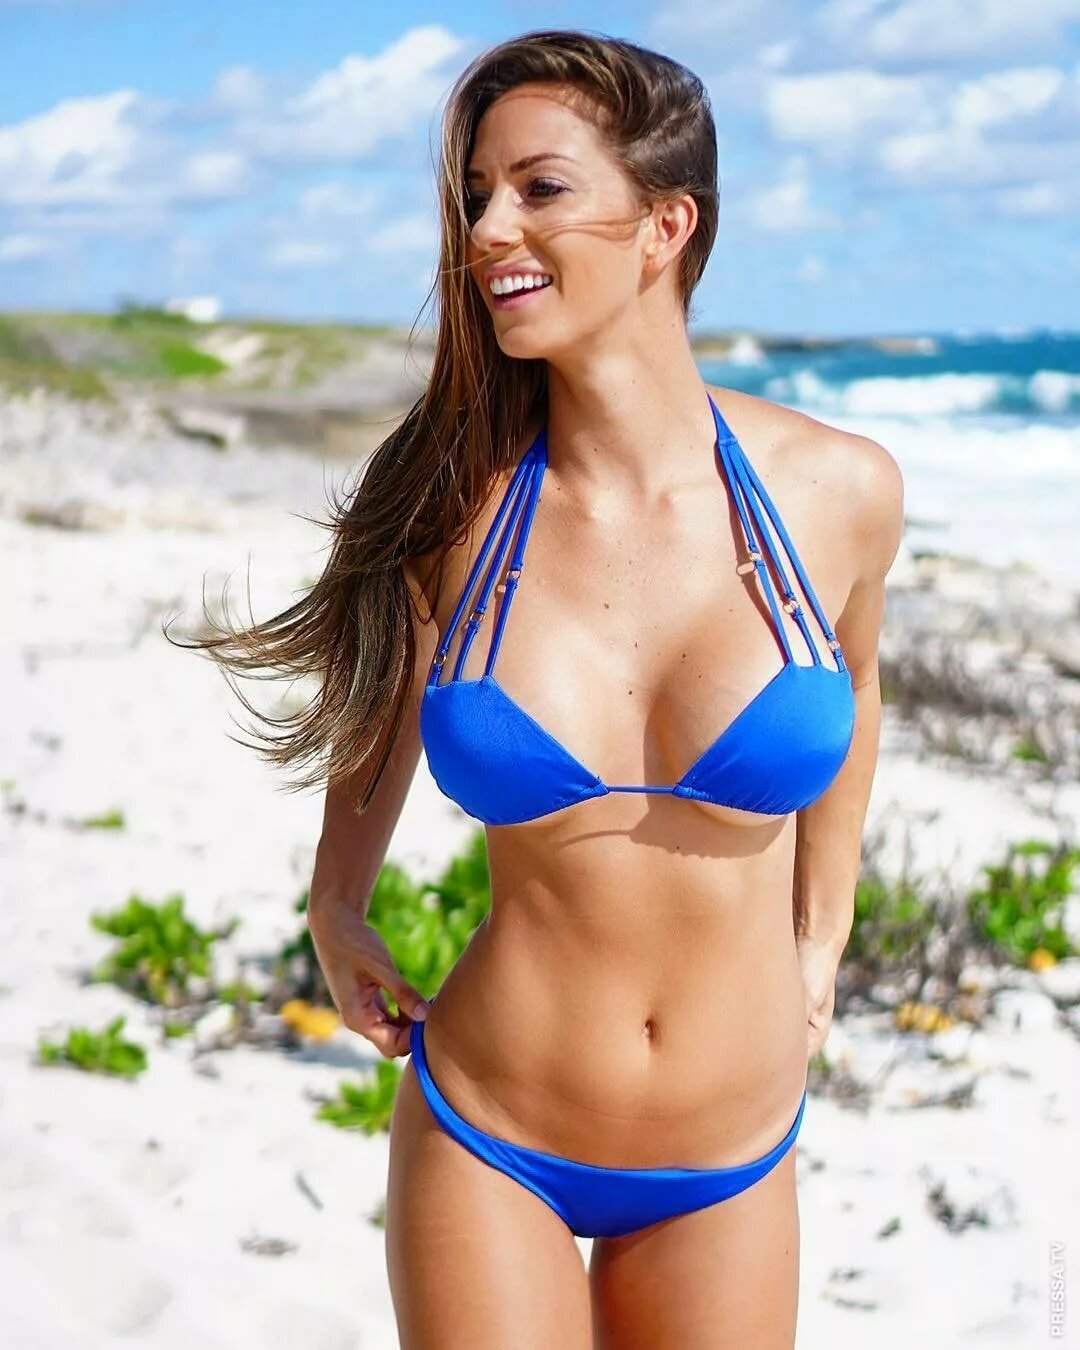 Bikini babes digital